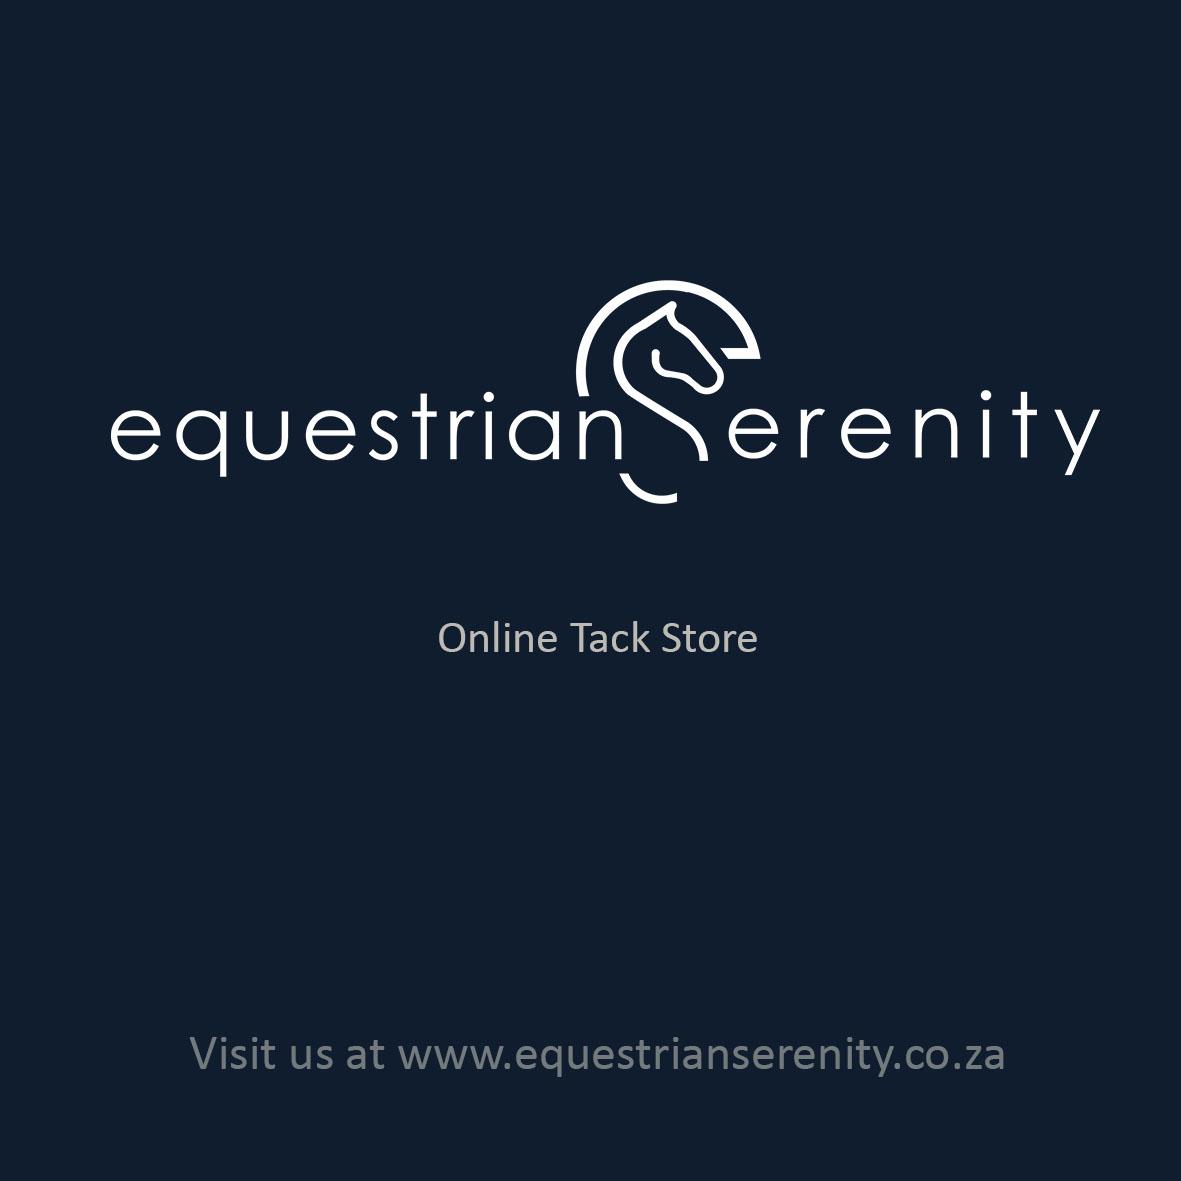 Equestrian Serenity